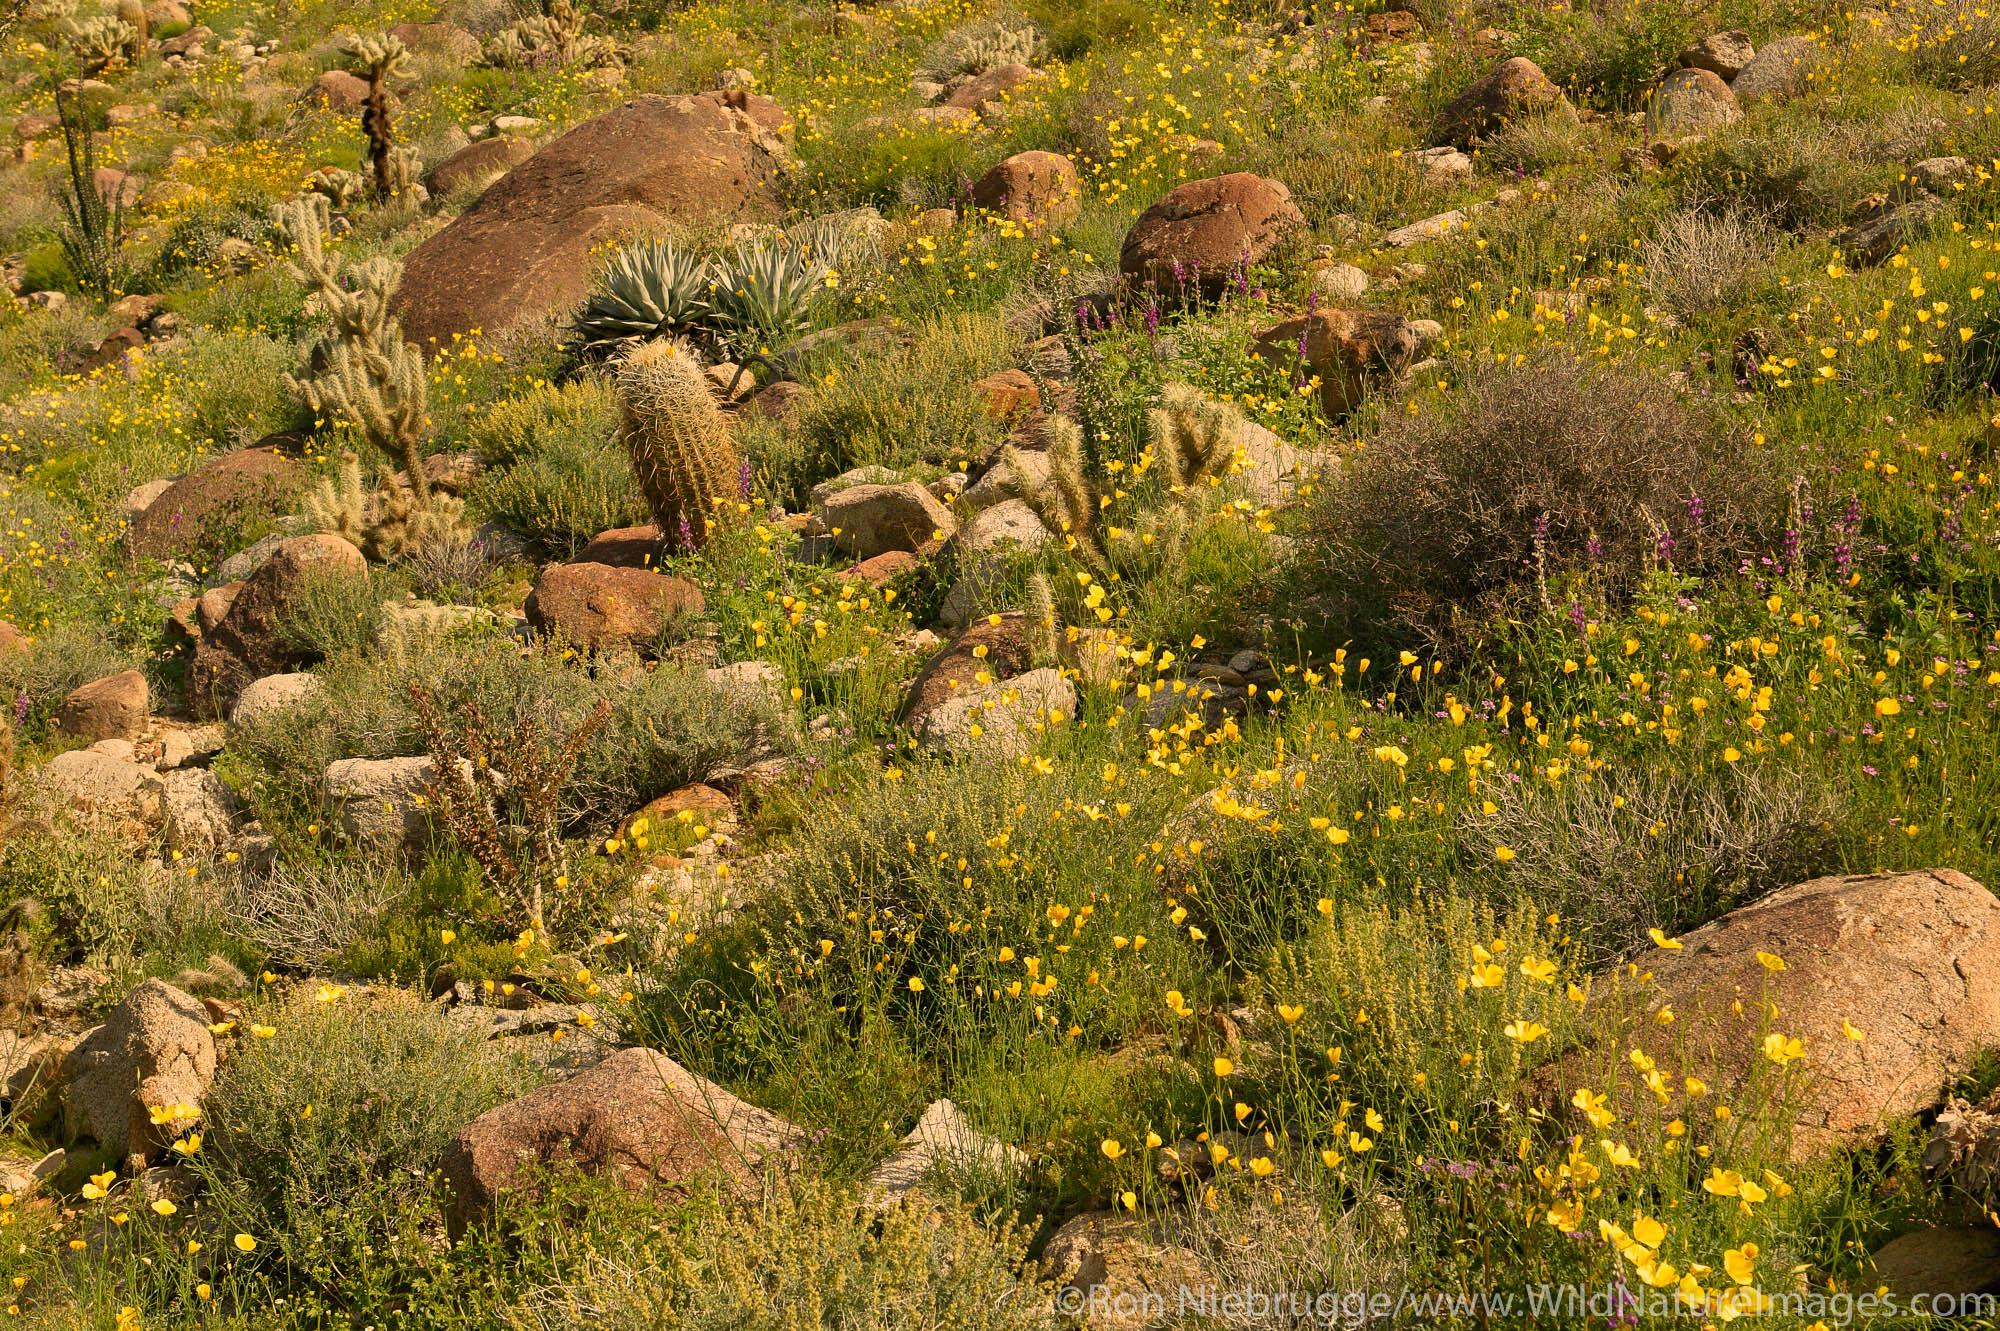 Wildflowers including Arizona Lupine (Lupinus arizonicus), poppies and Brittlebush (Encelia farinosa) Ocotillo  (Fouquieria splendens...